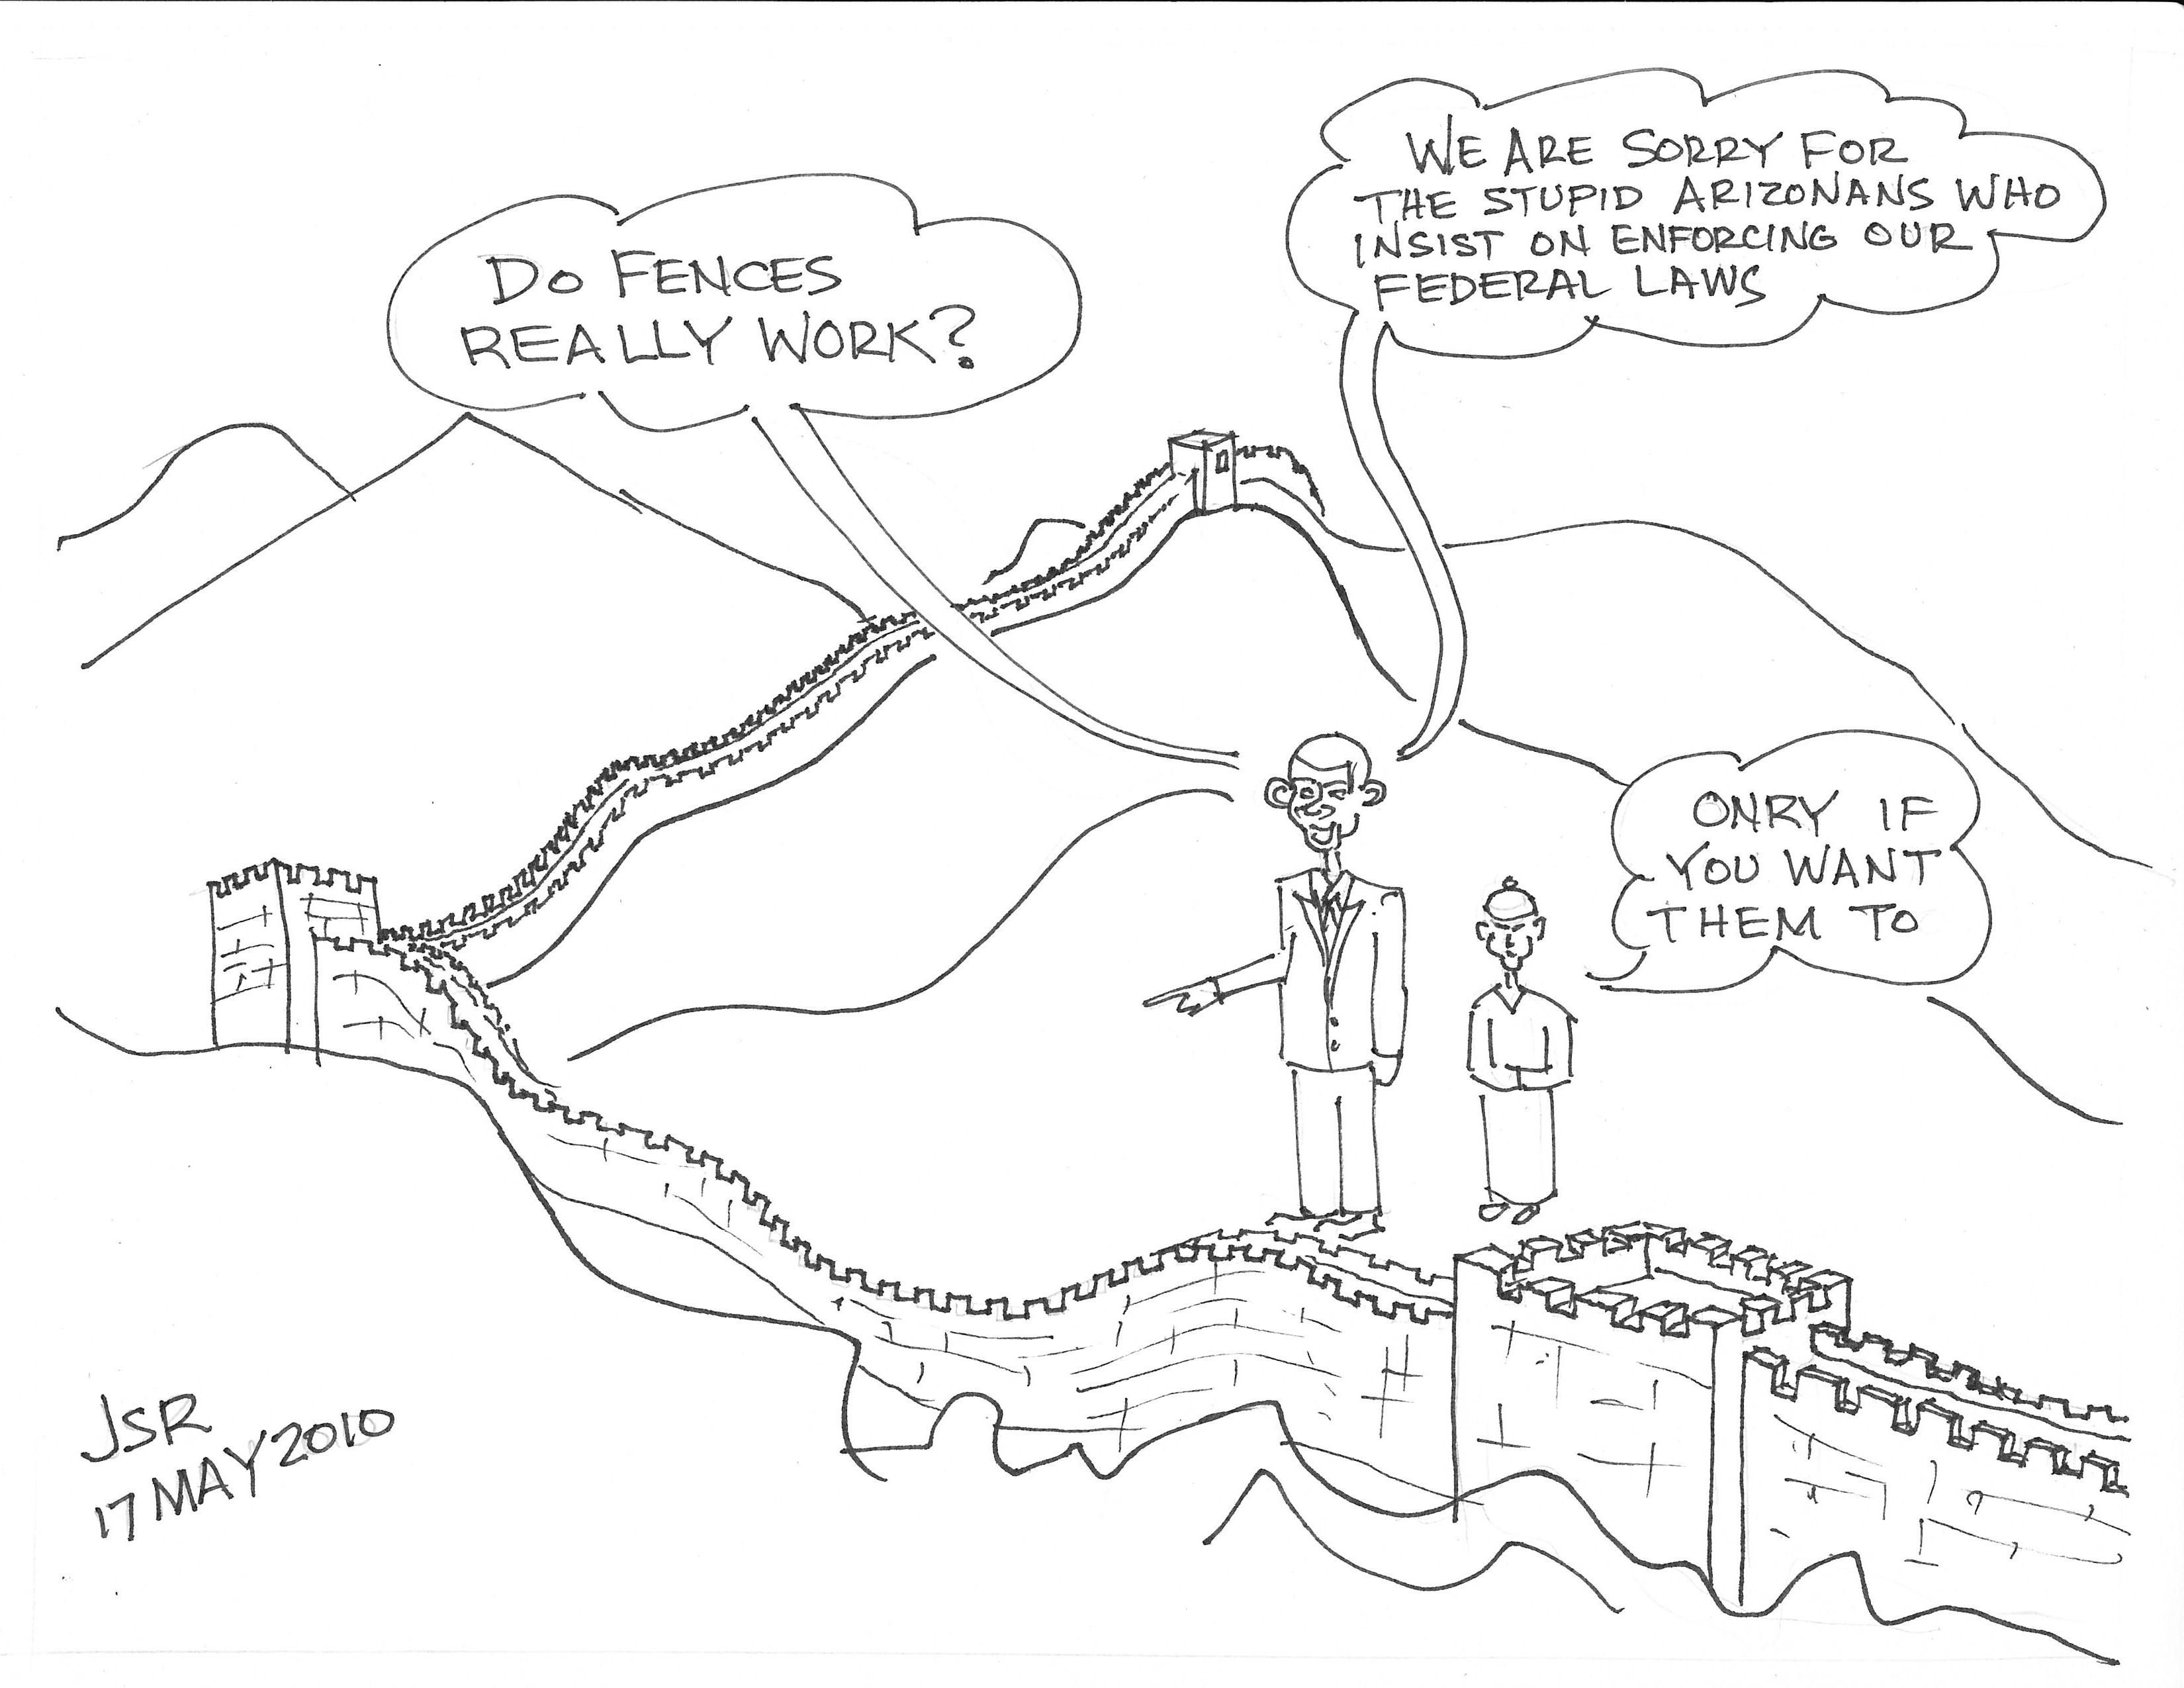 3300x2550 Great Wall Grumpa Joe's Place